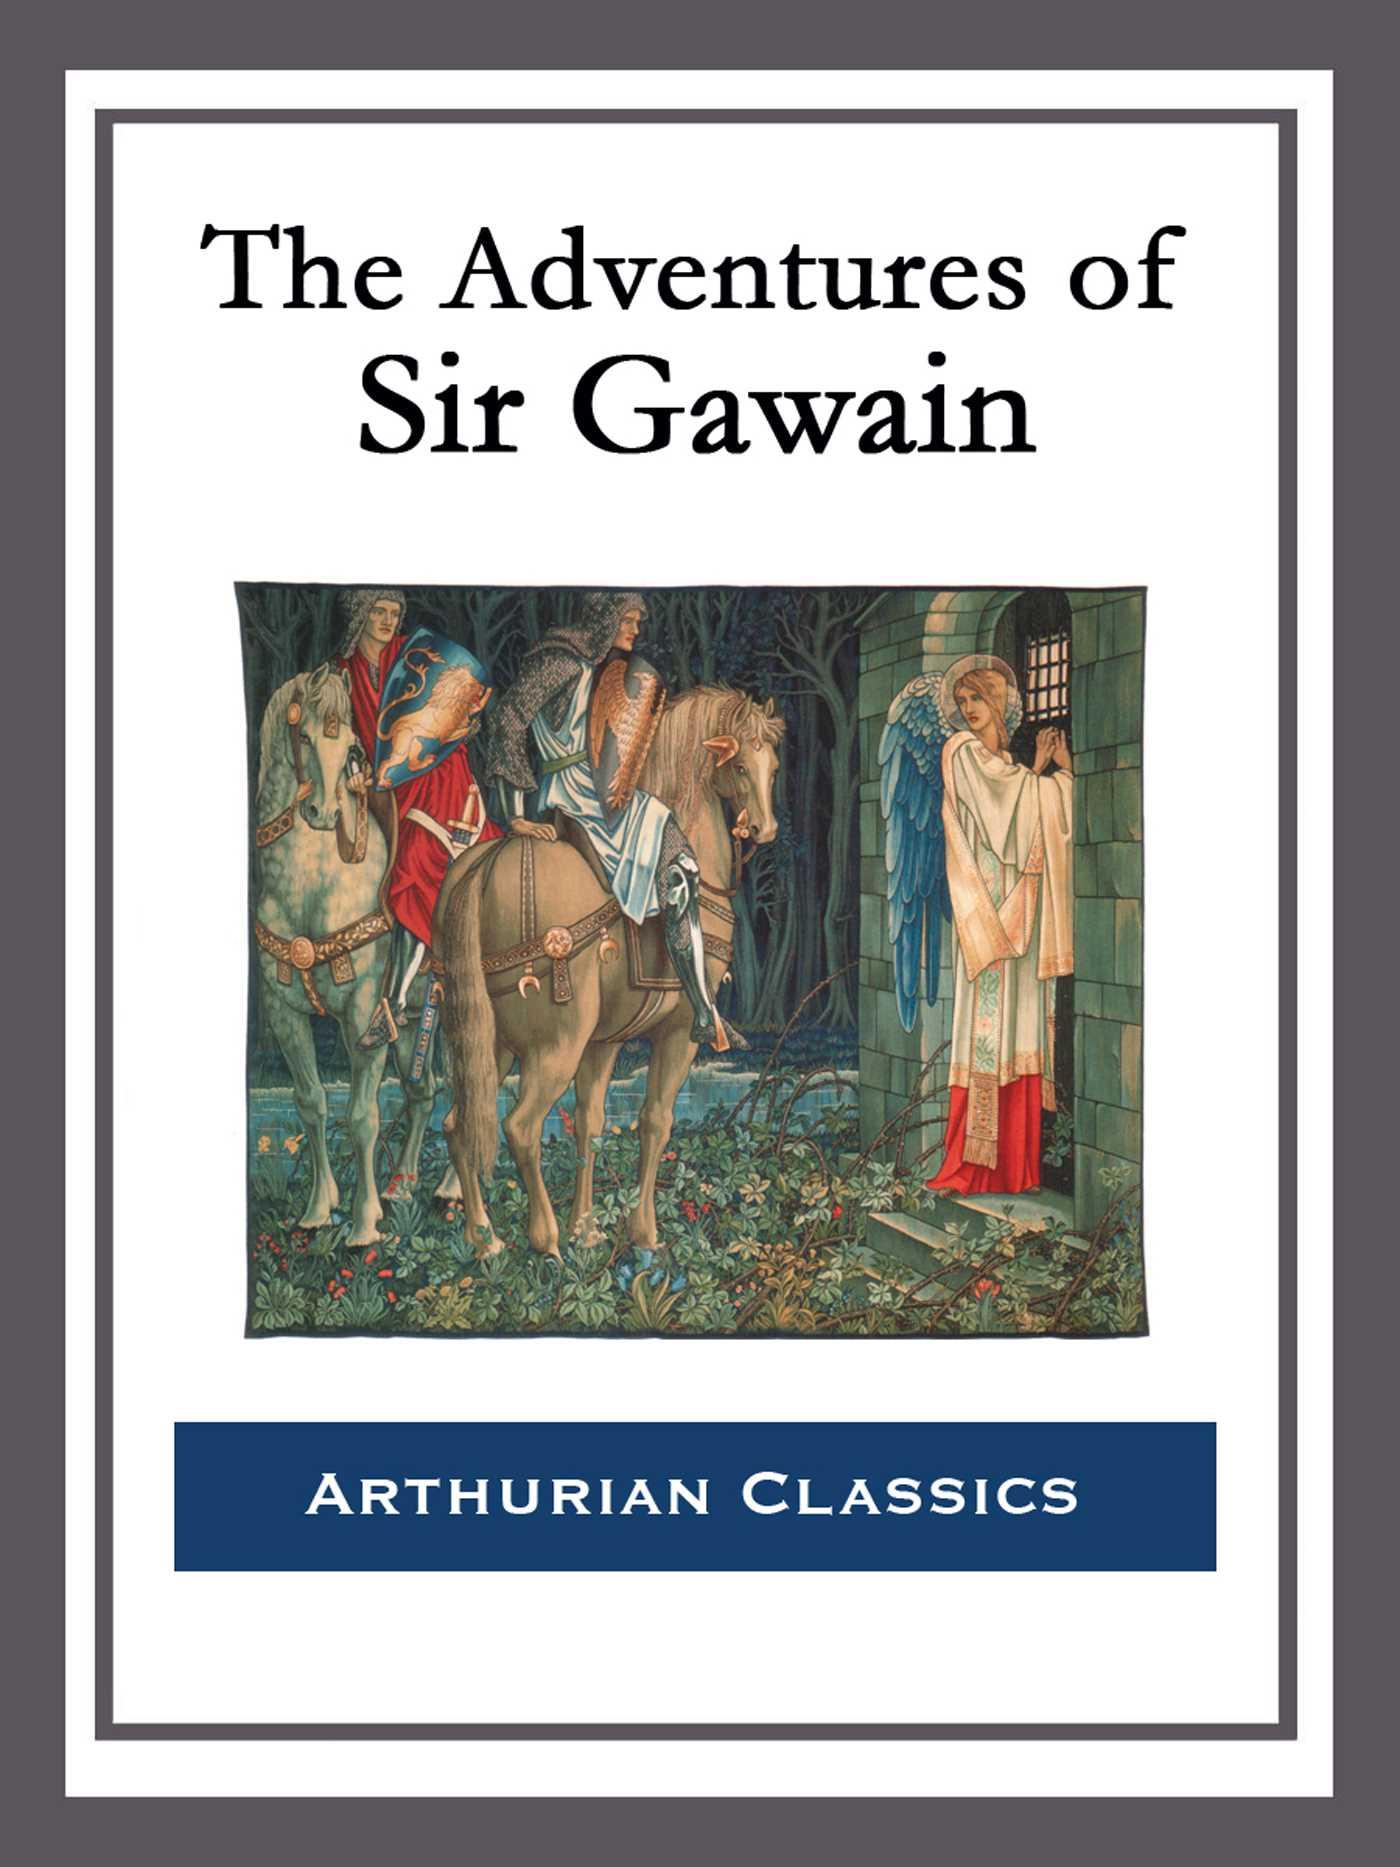 The adventures of sir gawain 9781682991930 hr